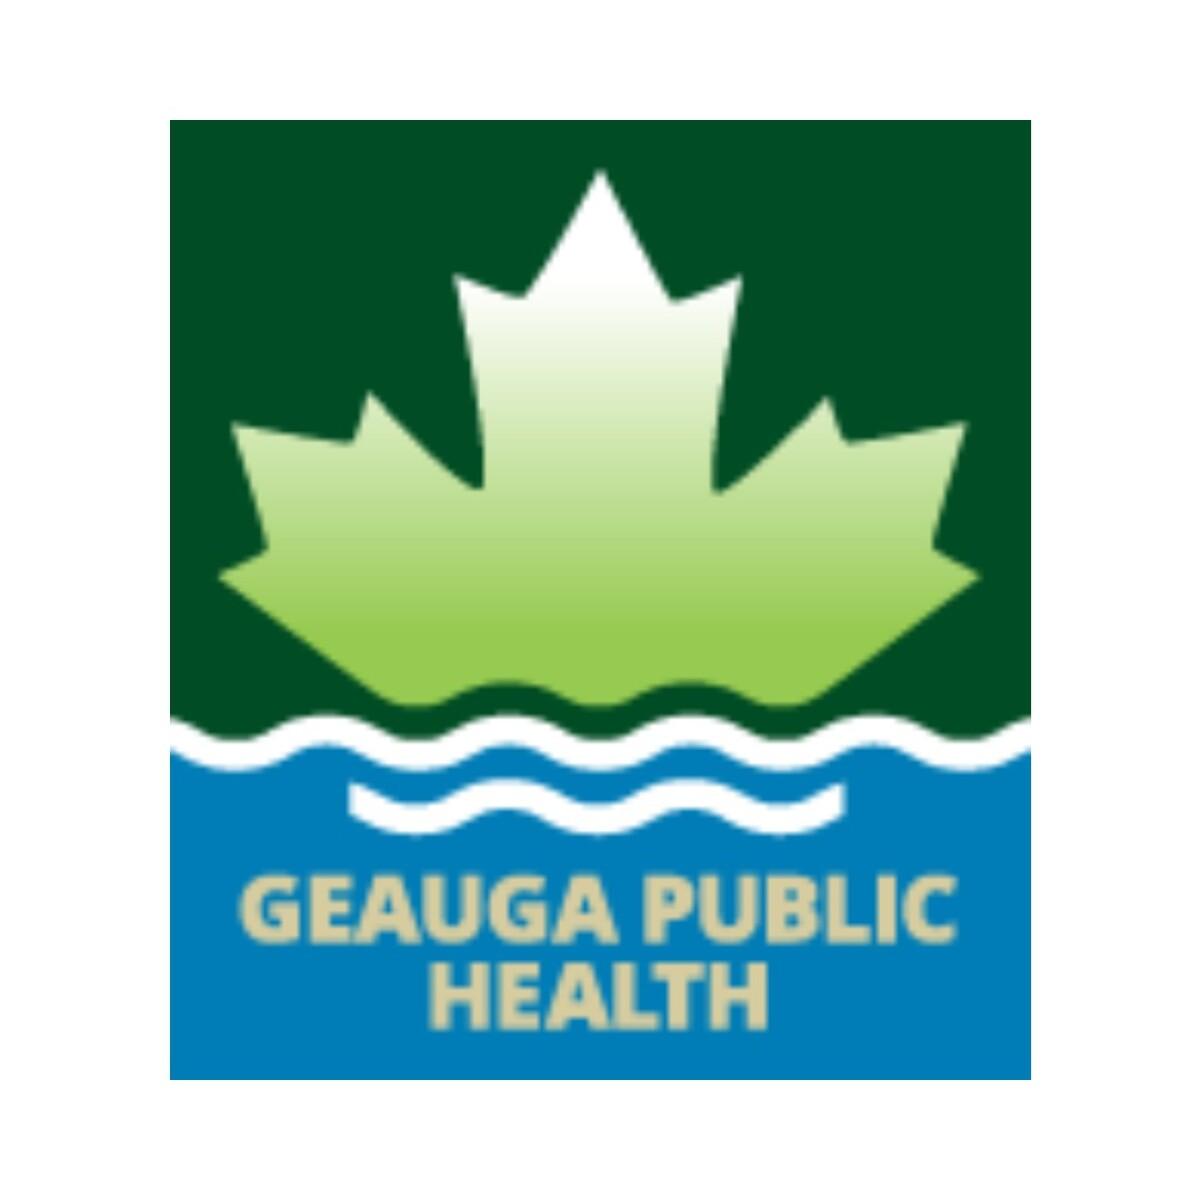 Geauga Public Health Logo